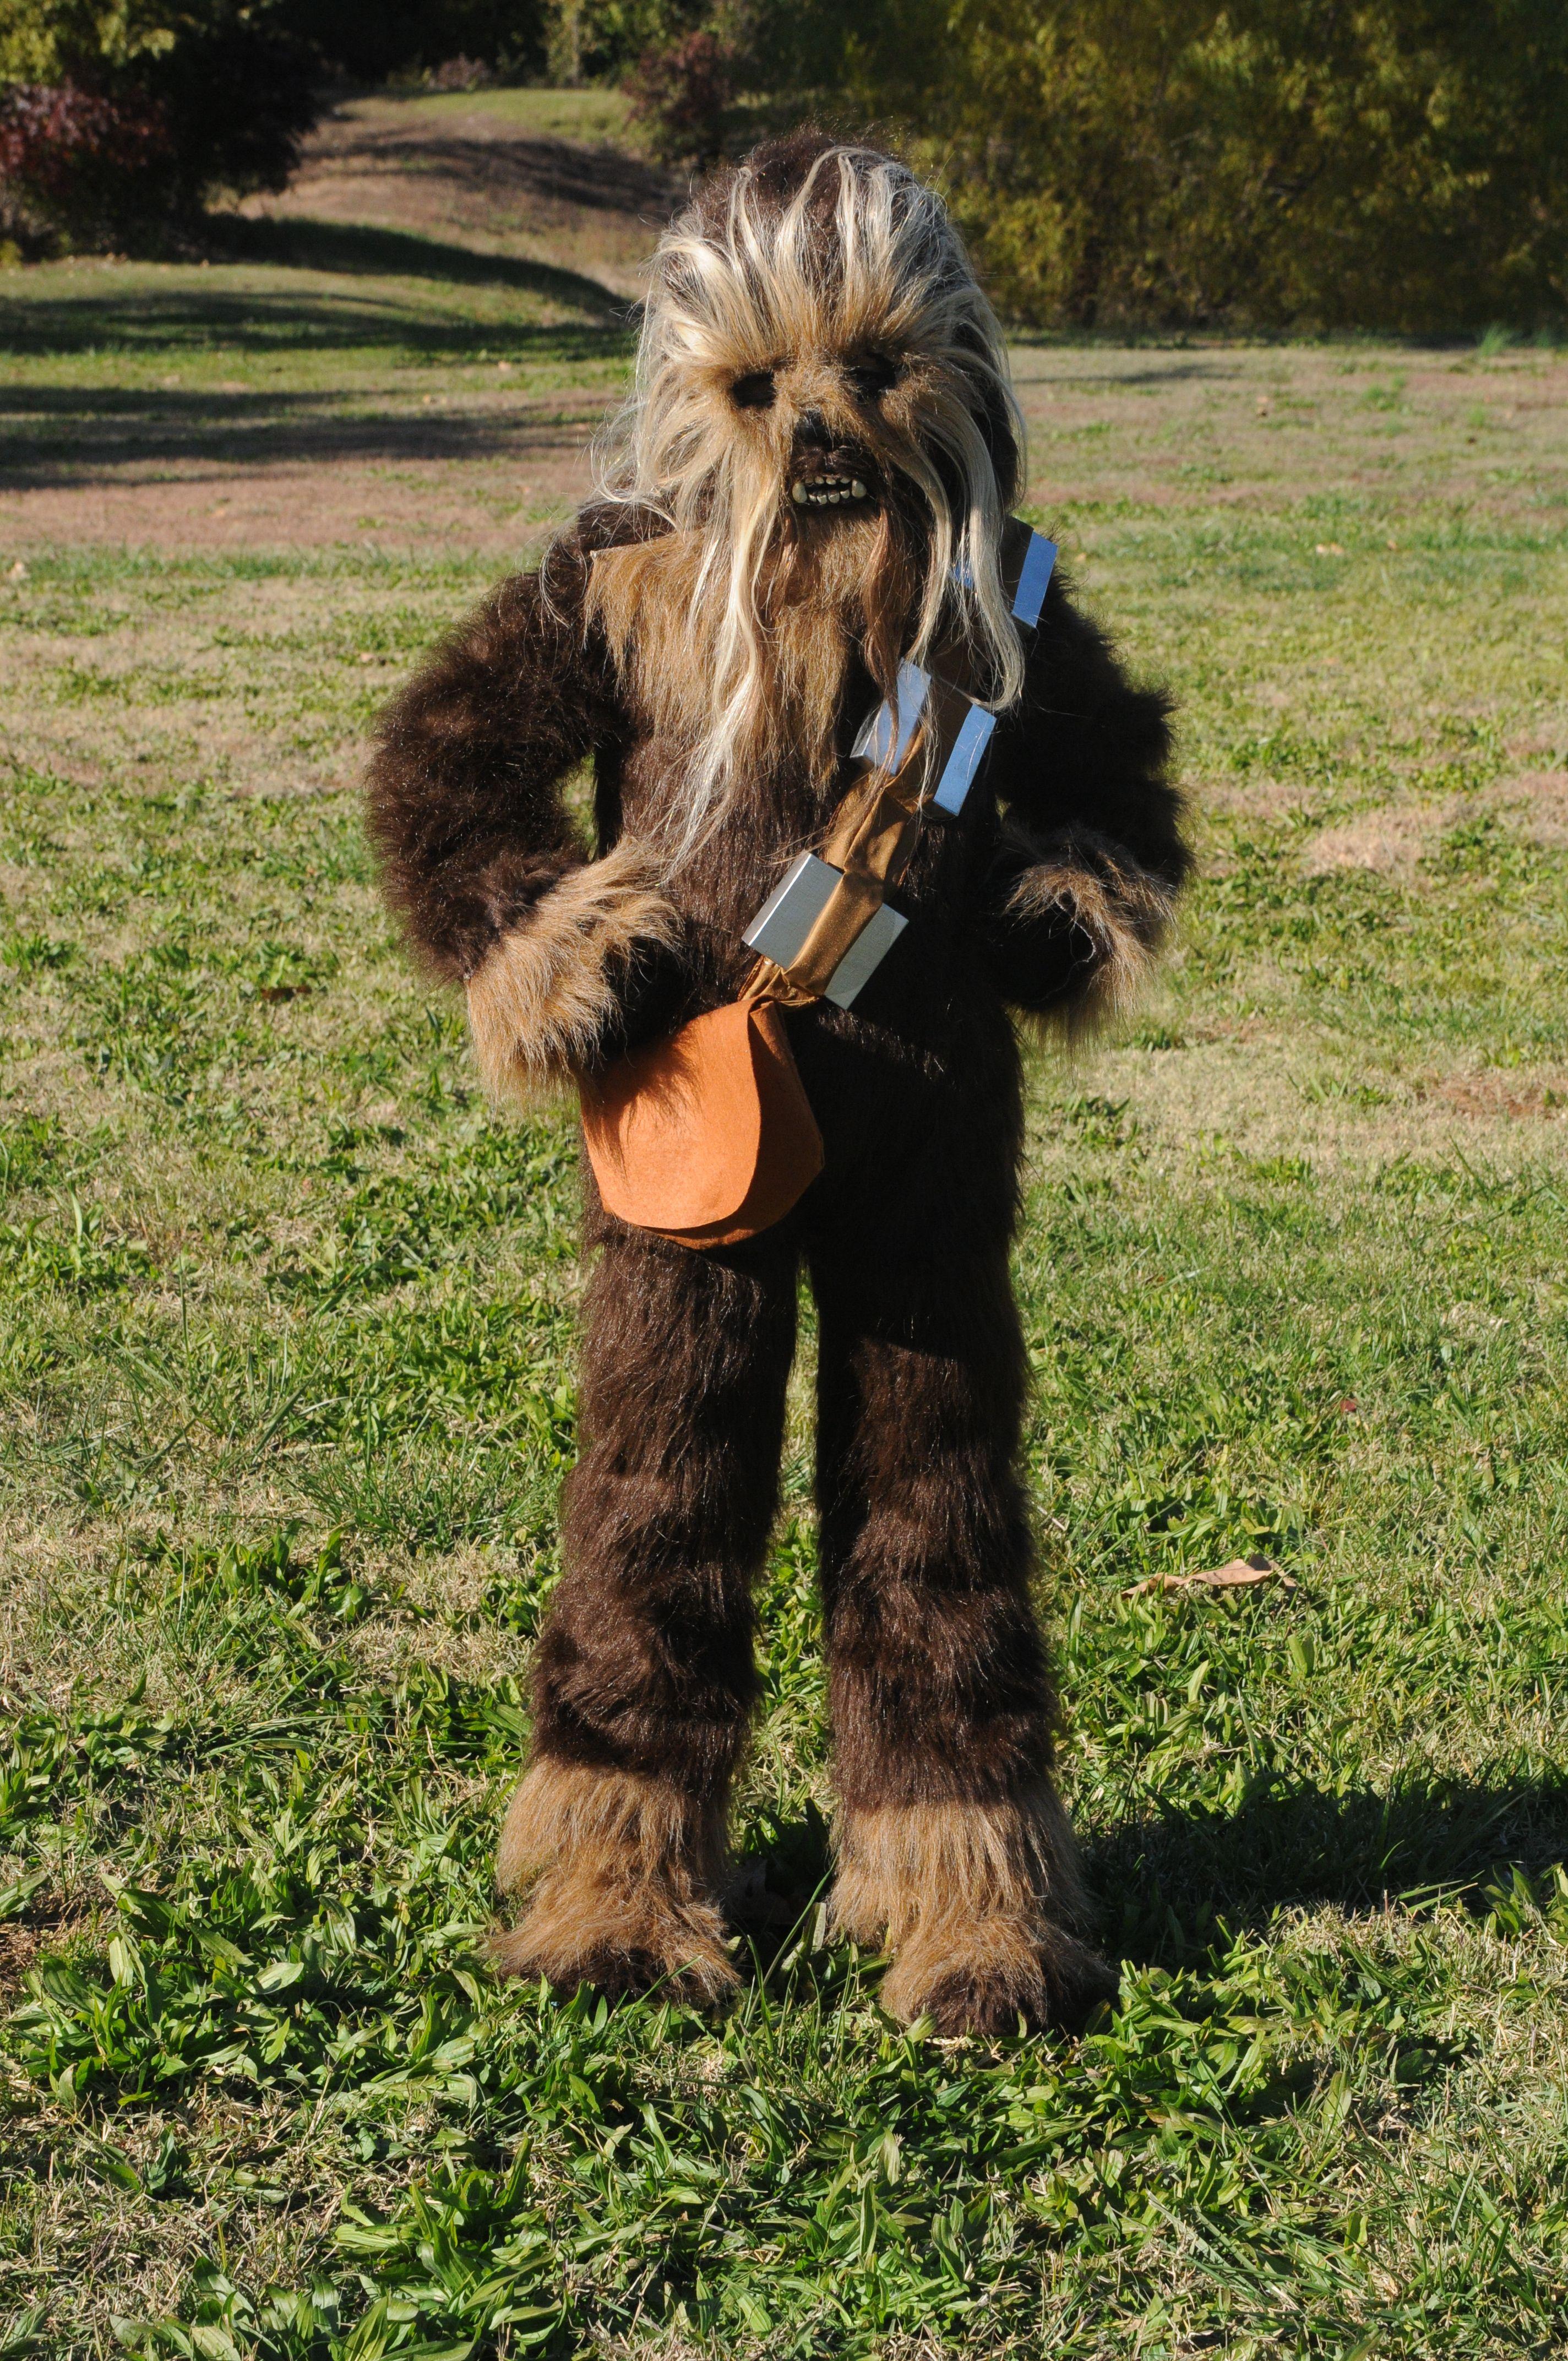 Chewbacca Star Wars costume | Halloween | Pinterest | Star wars ...